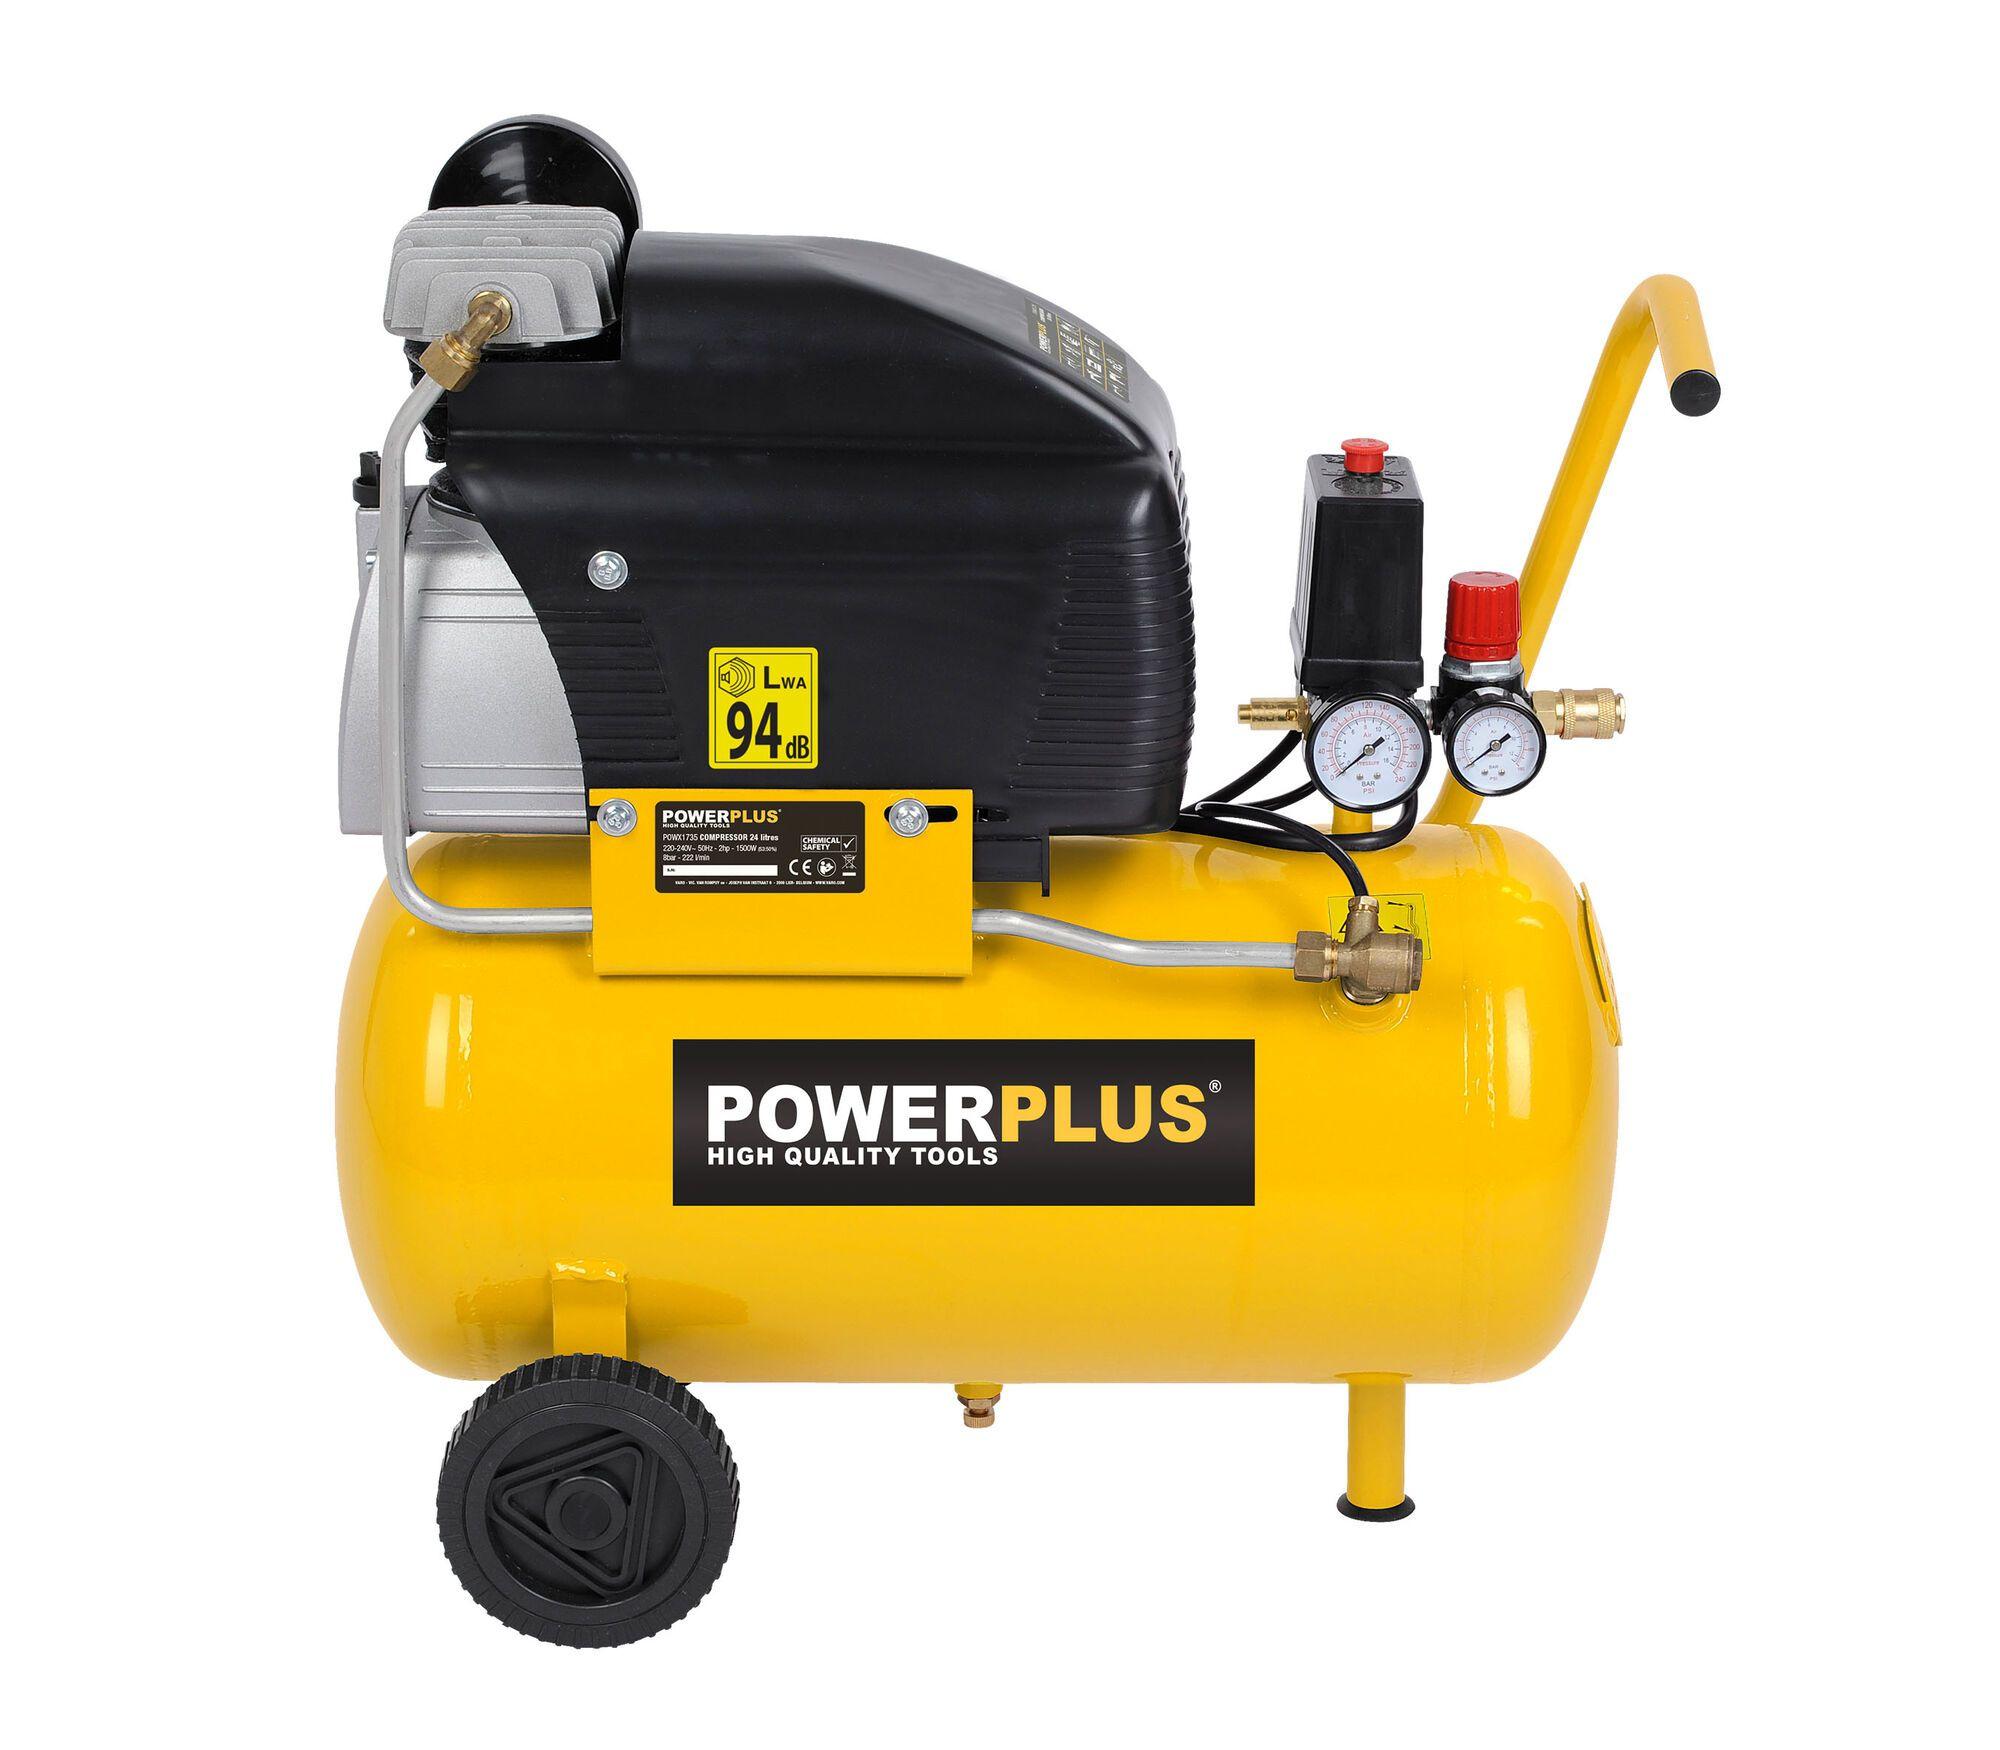 Powerplus POWX1735 1500W Mobiele compressor met 24 liter tank (compressoren)